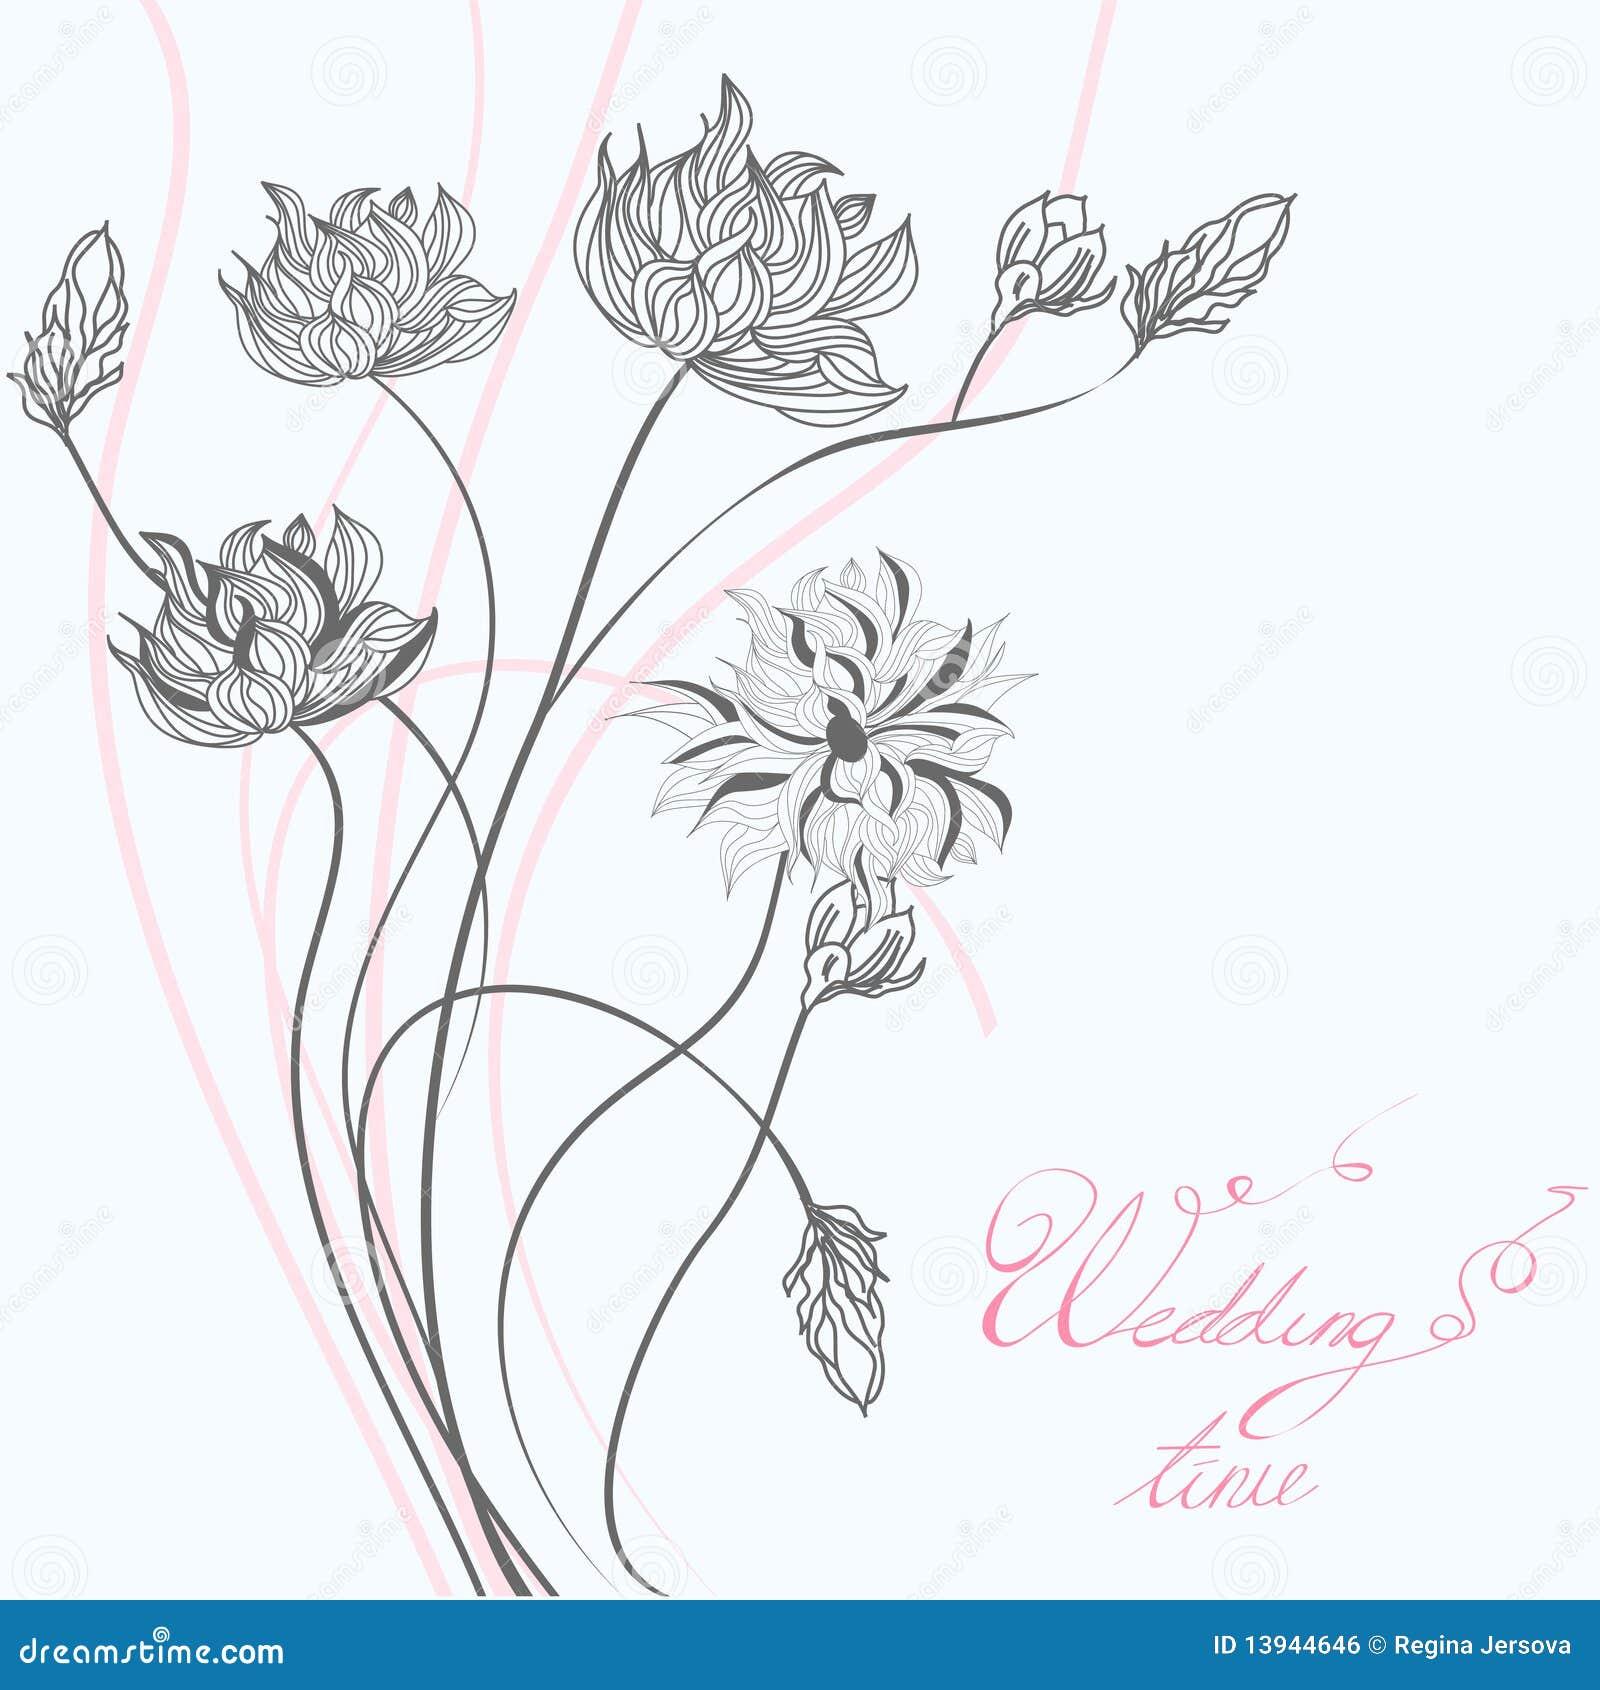 singing birthday cards ecards elegant 30 wedding greeting cards